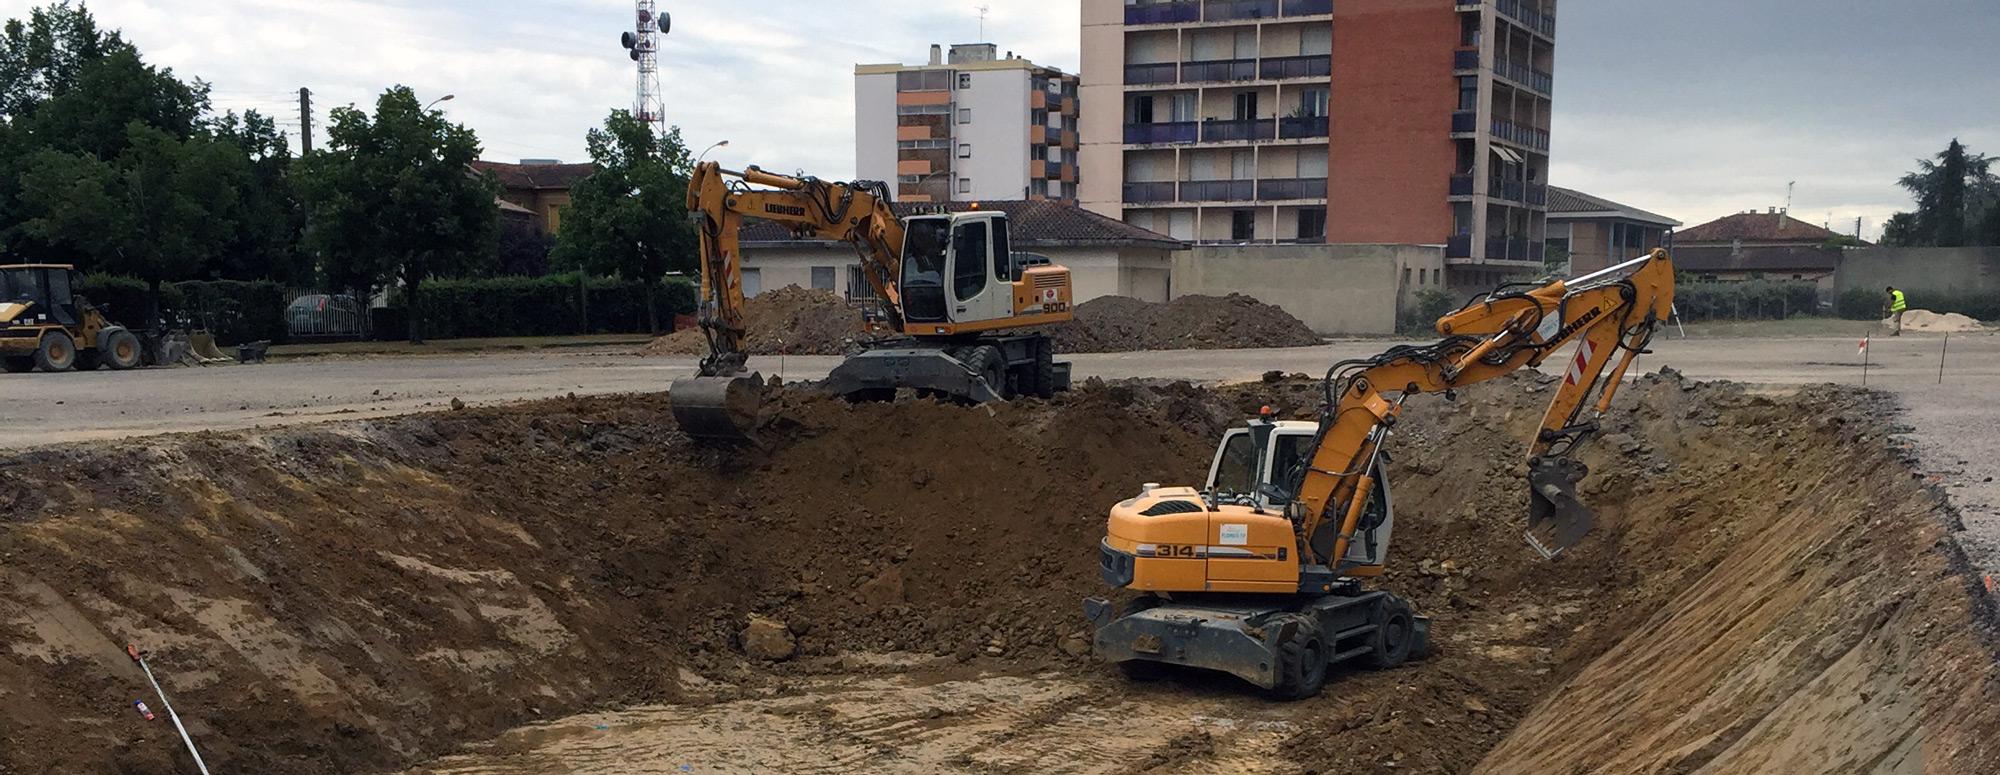 travaux public Montauban